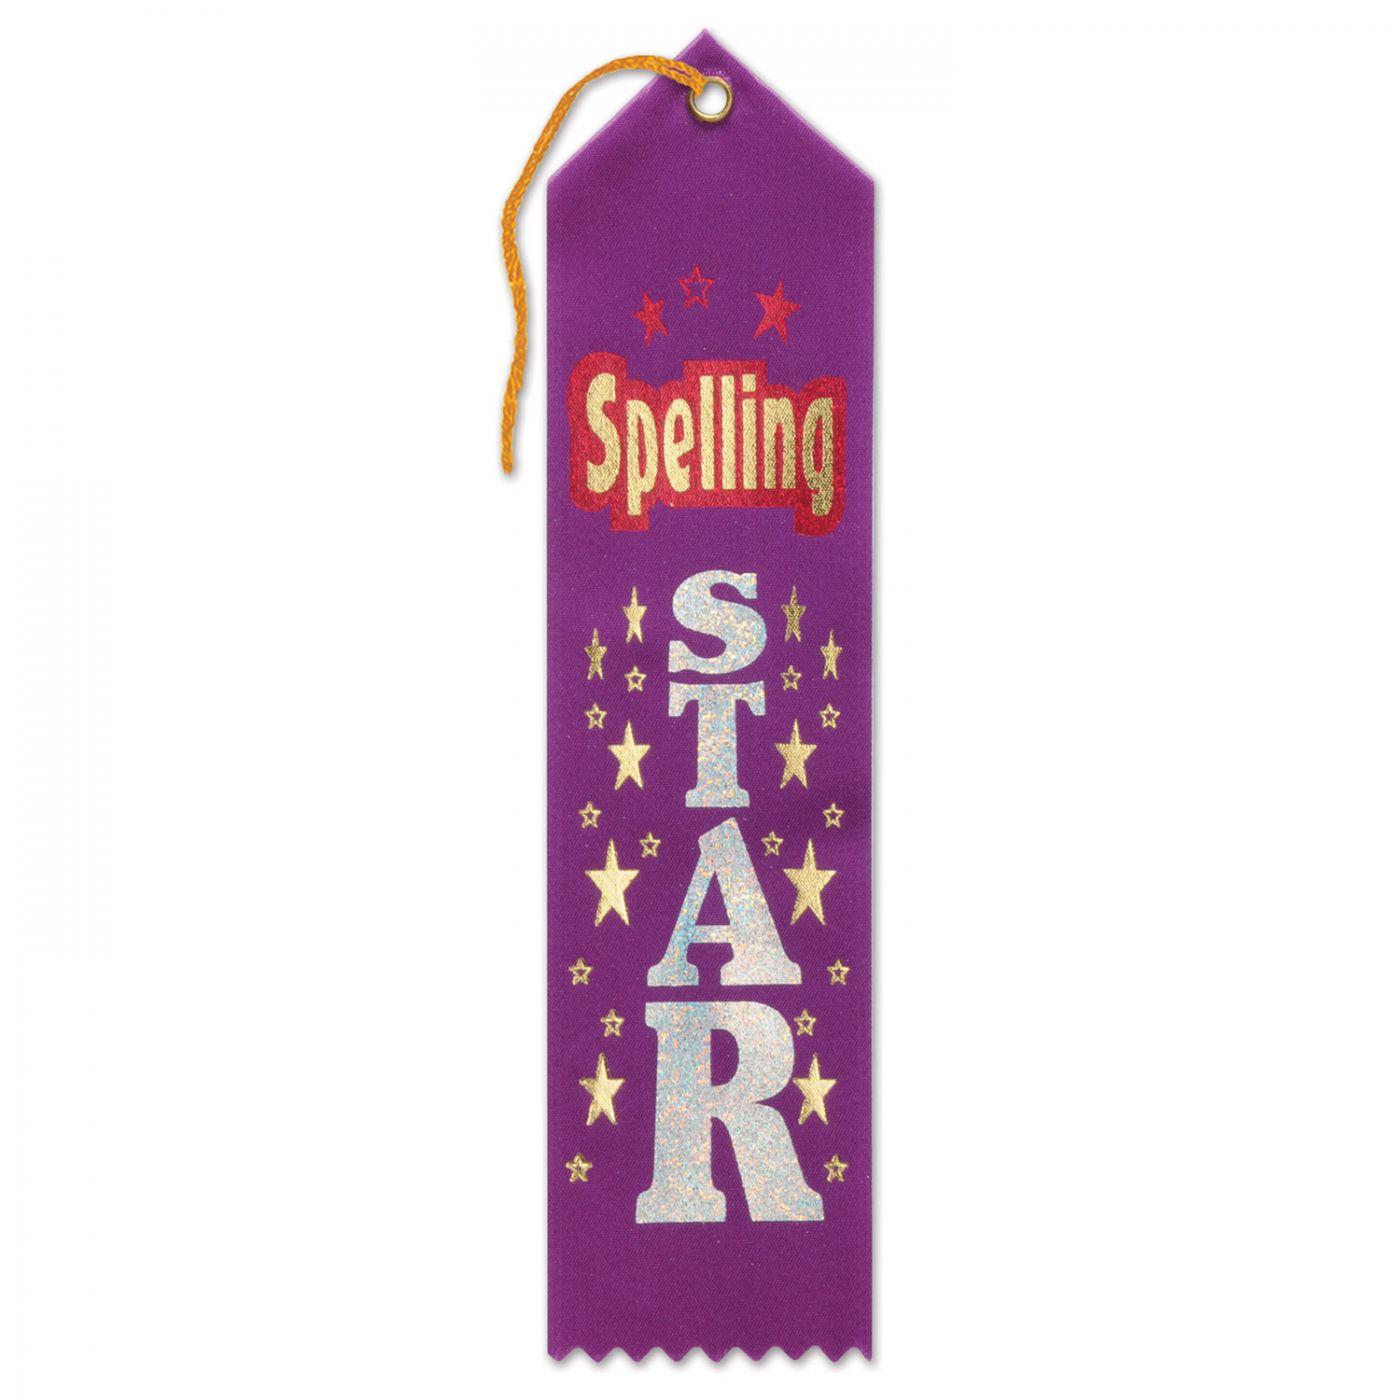 Spelling Star Award Ribbon (6) image